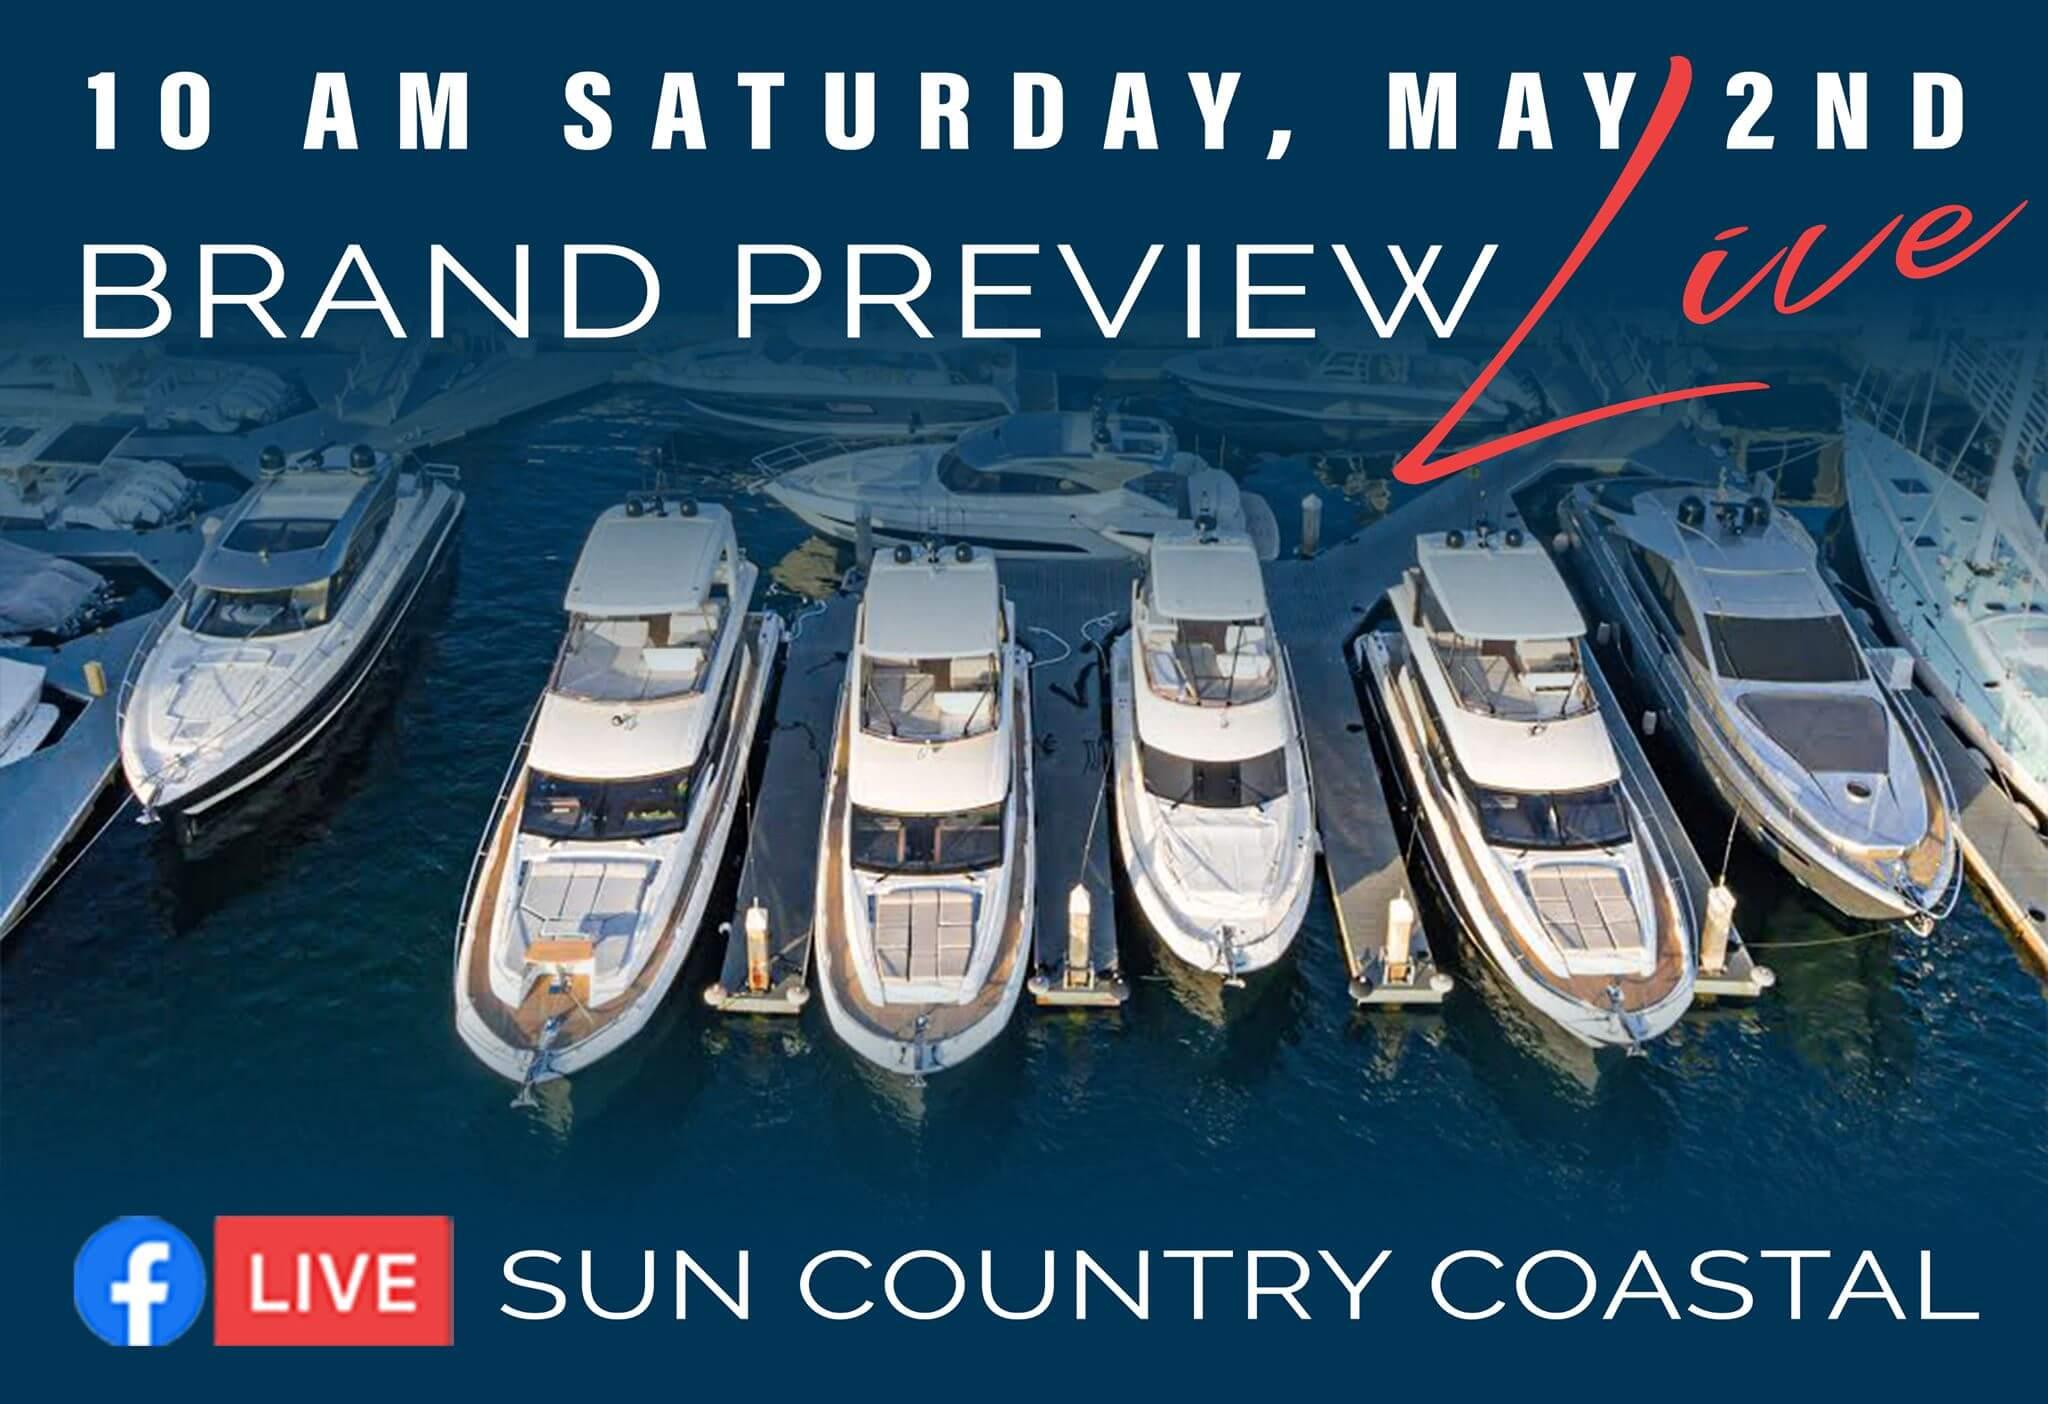 https://suncountrymarinegroup.com/wp-content/uploads/2020/05/scc-05-02-2020-event.jpg